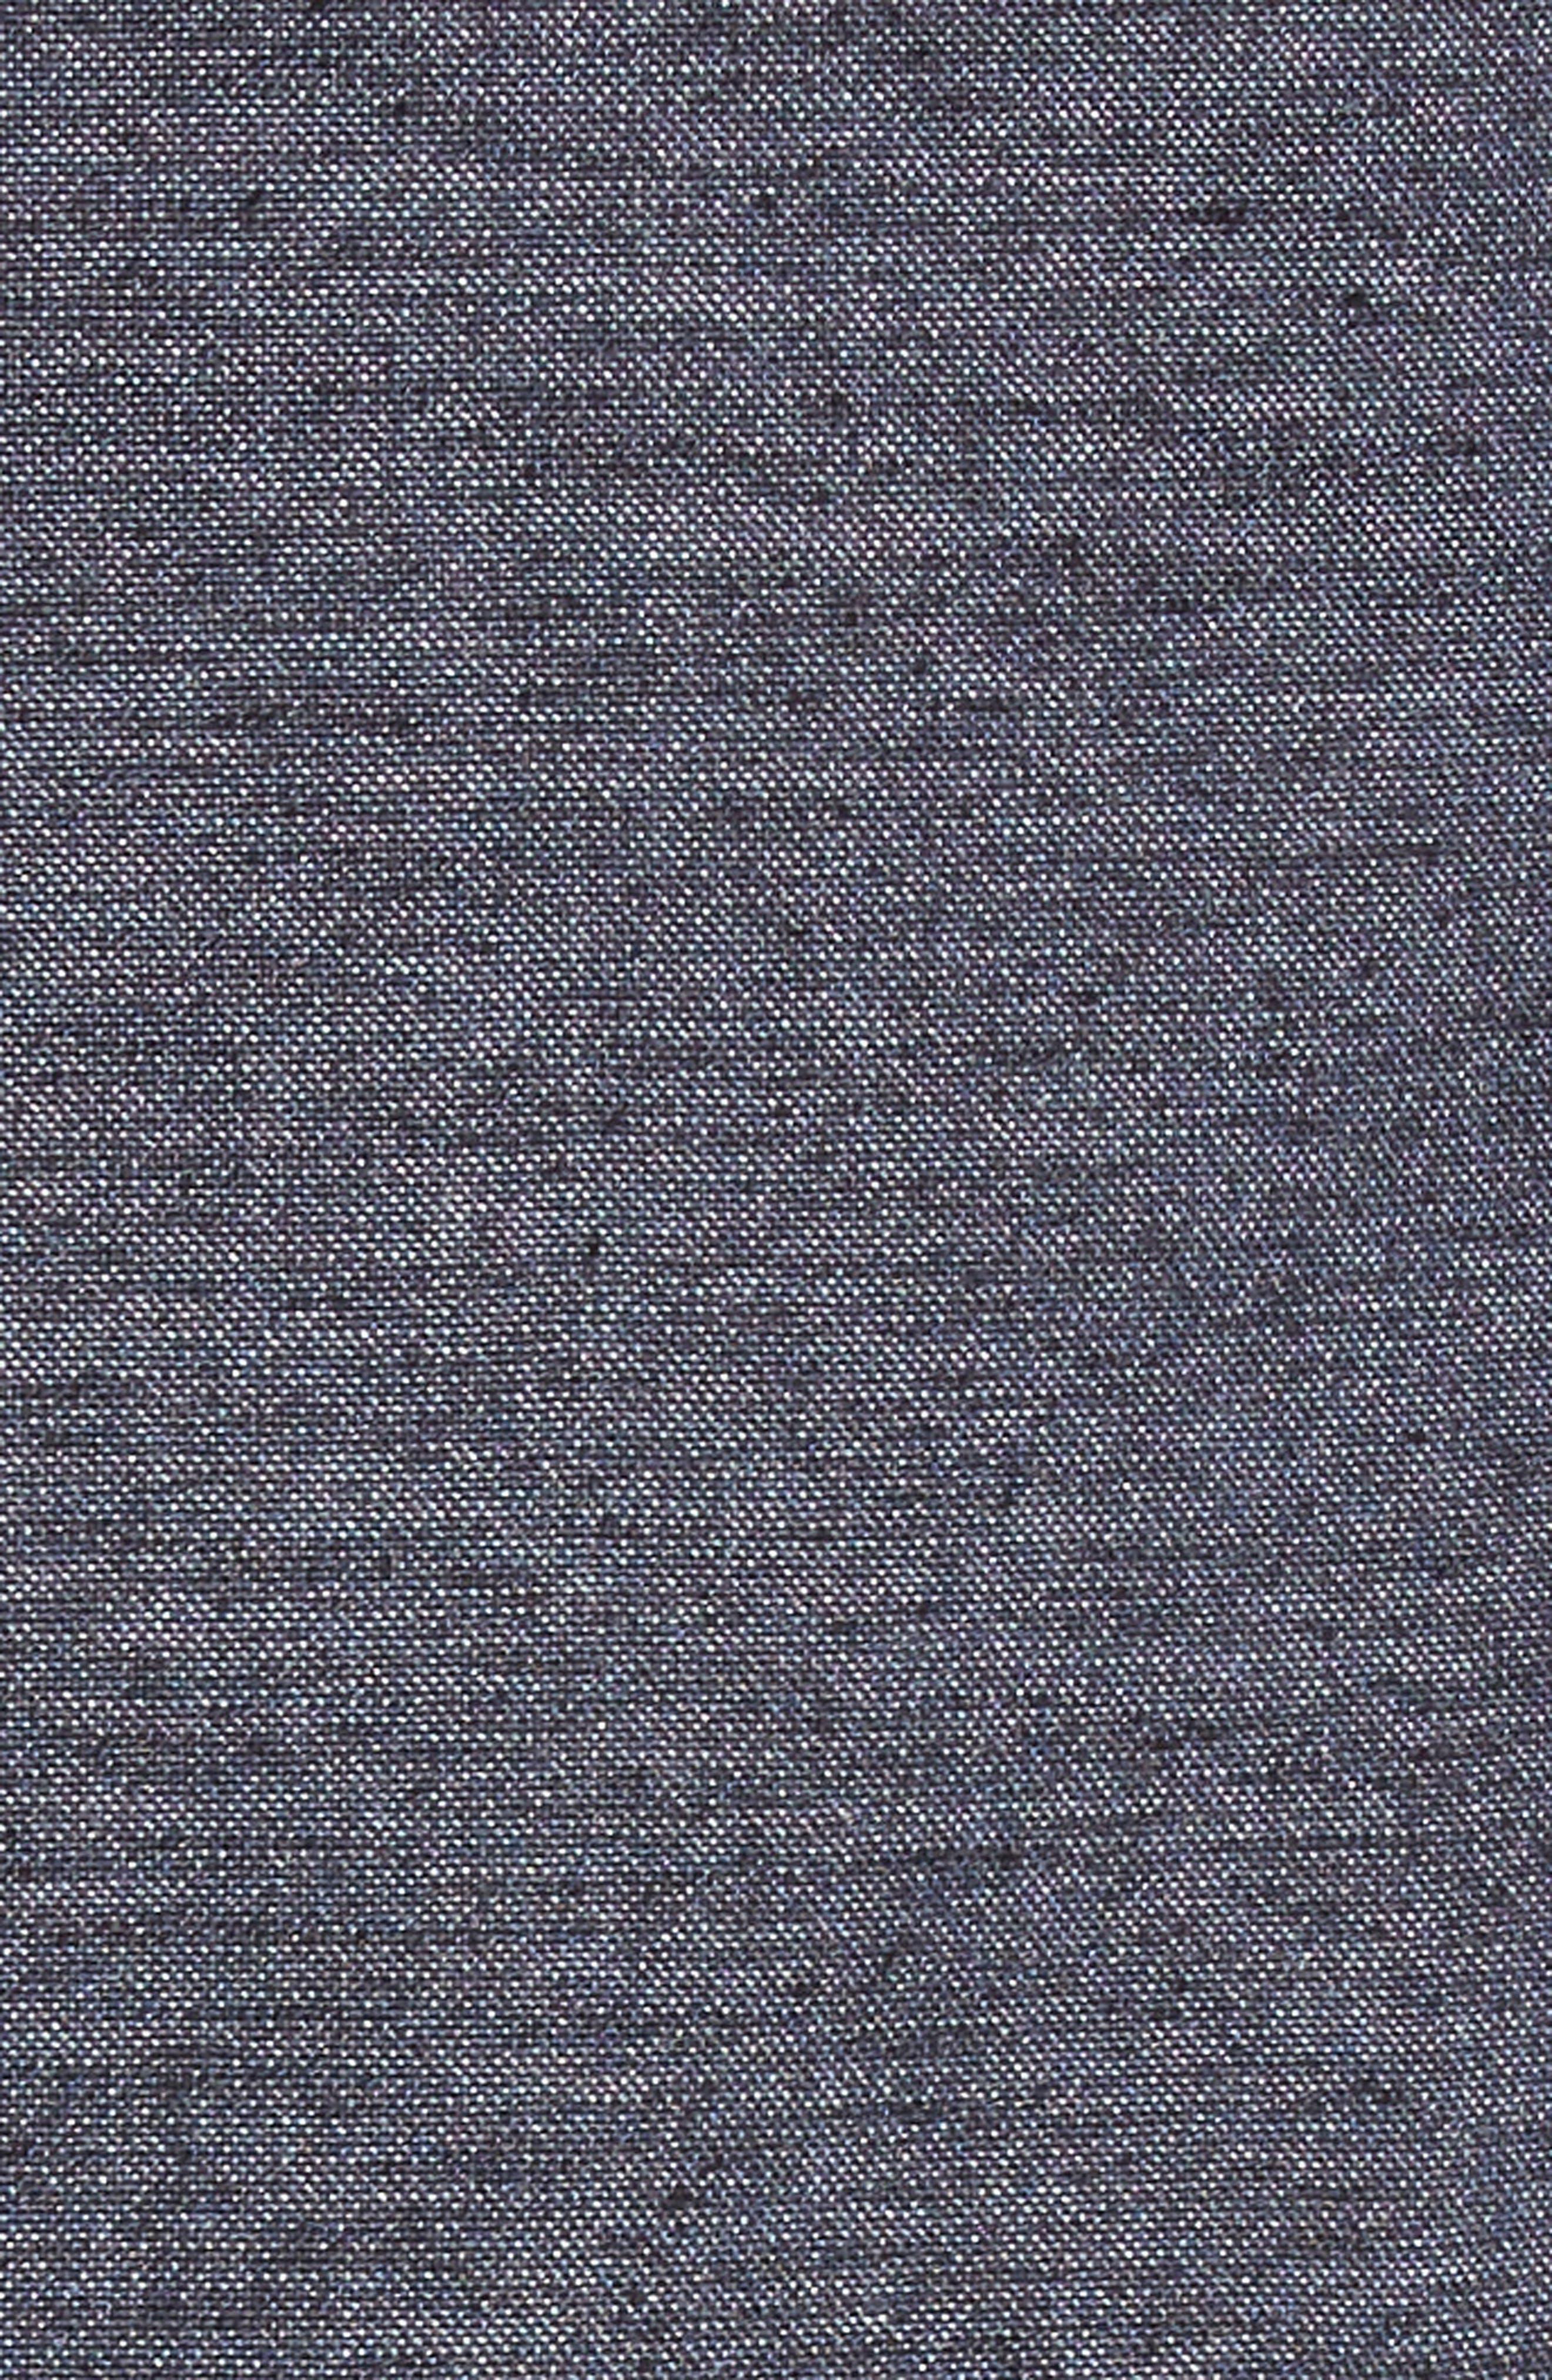 Slim Fit Jersey Blazer,                             Alternate thumbnail 6, color,                             400